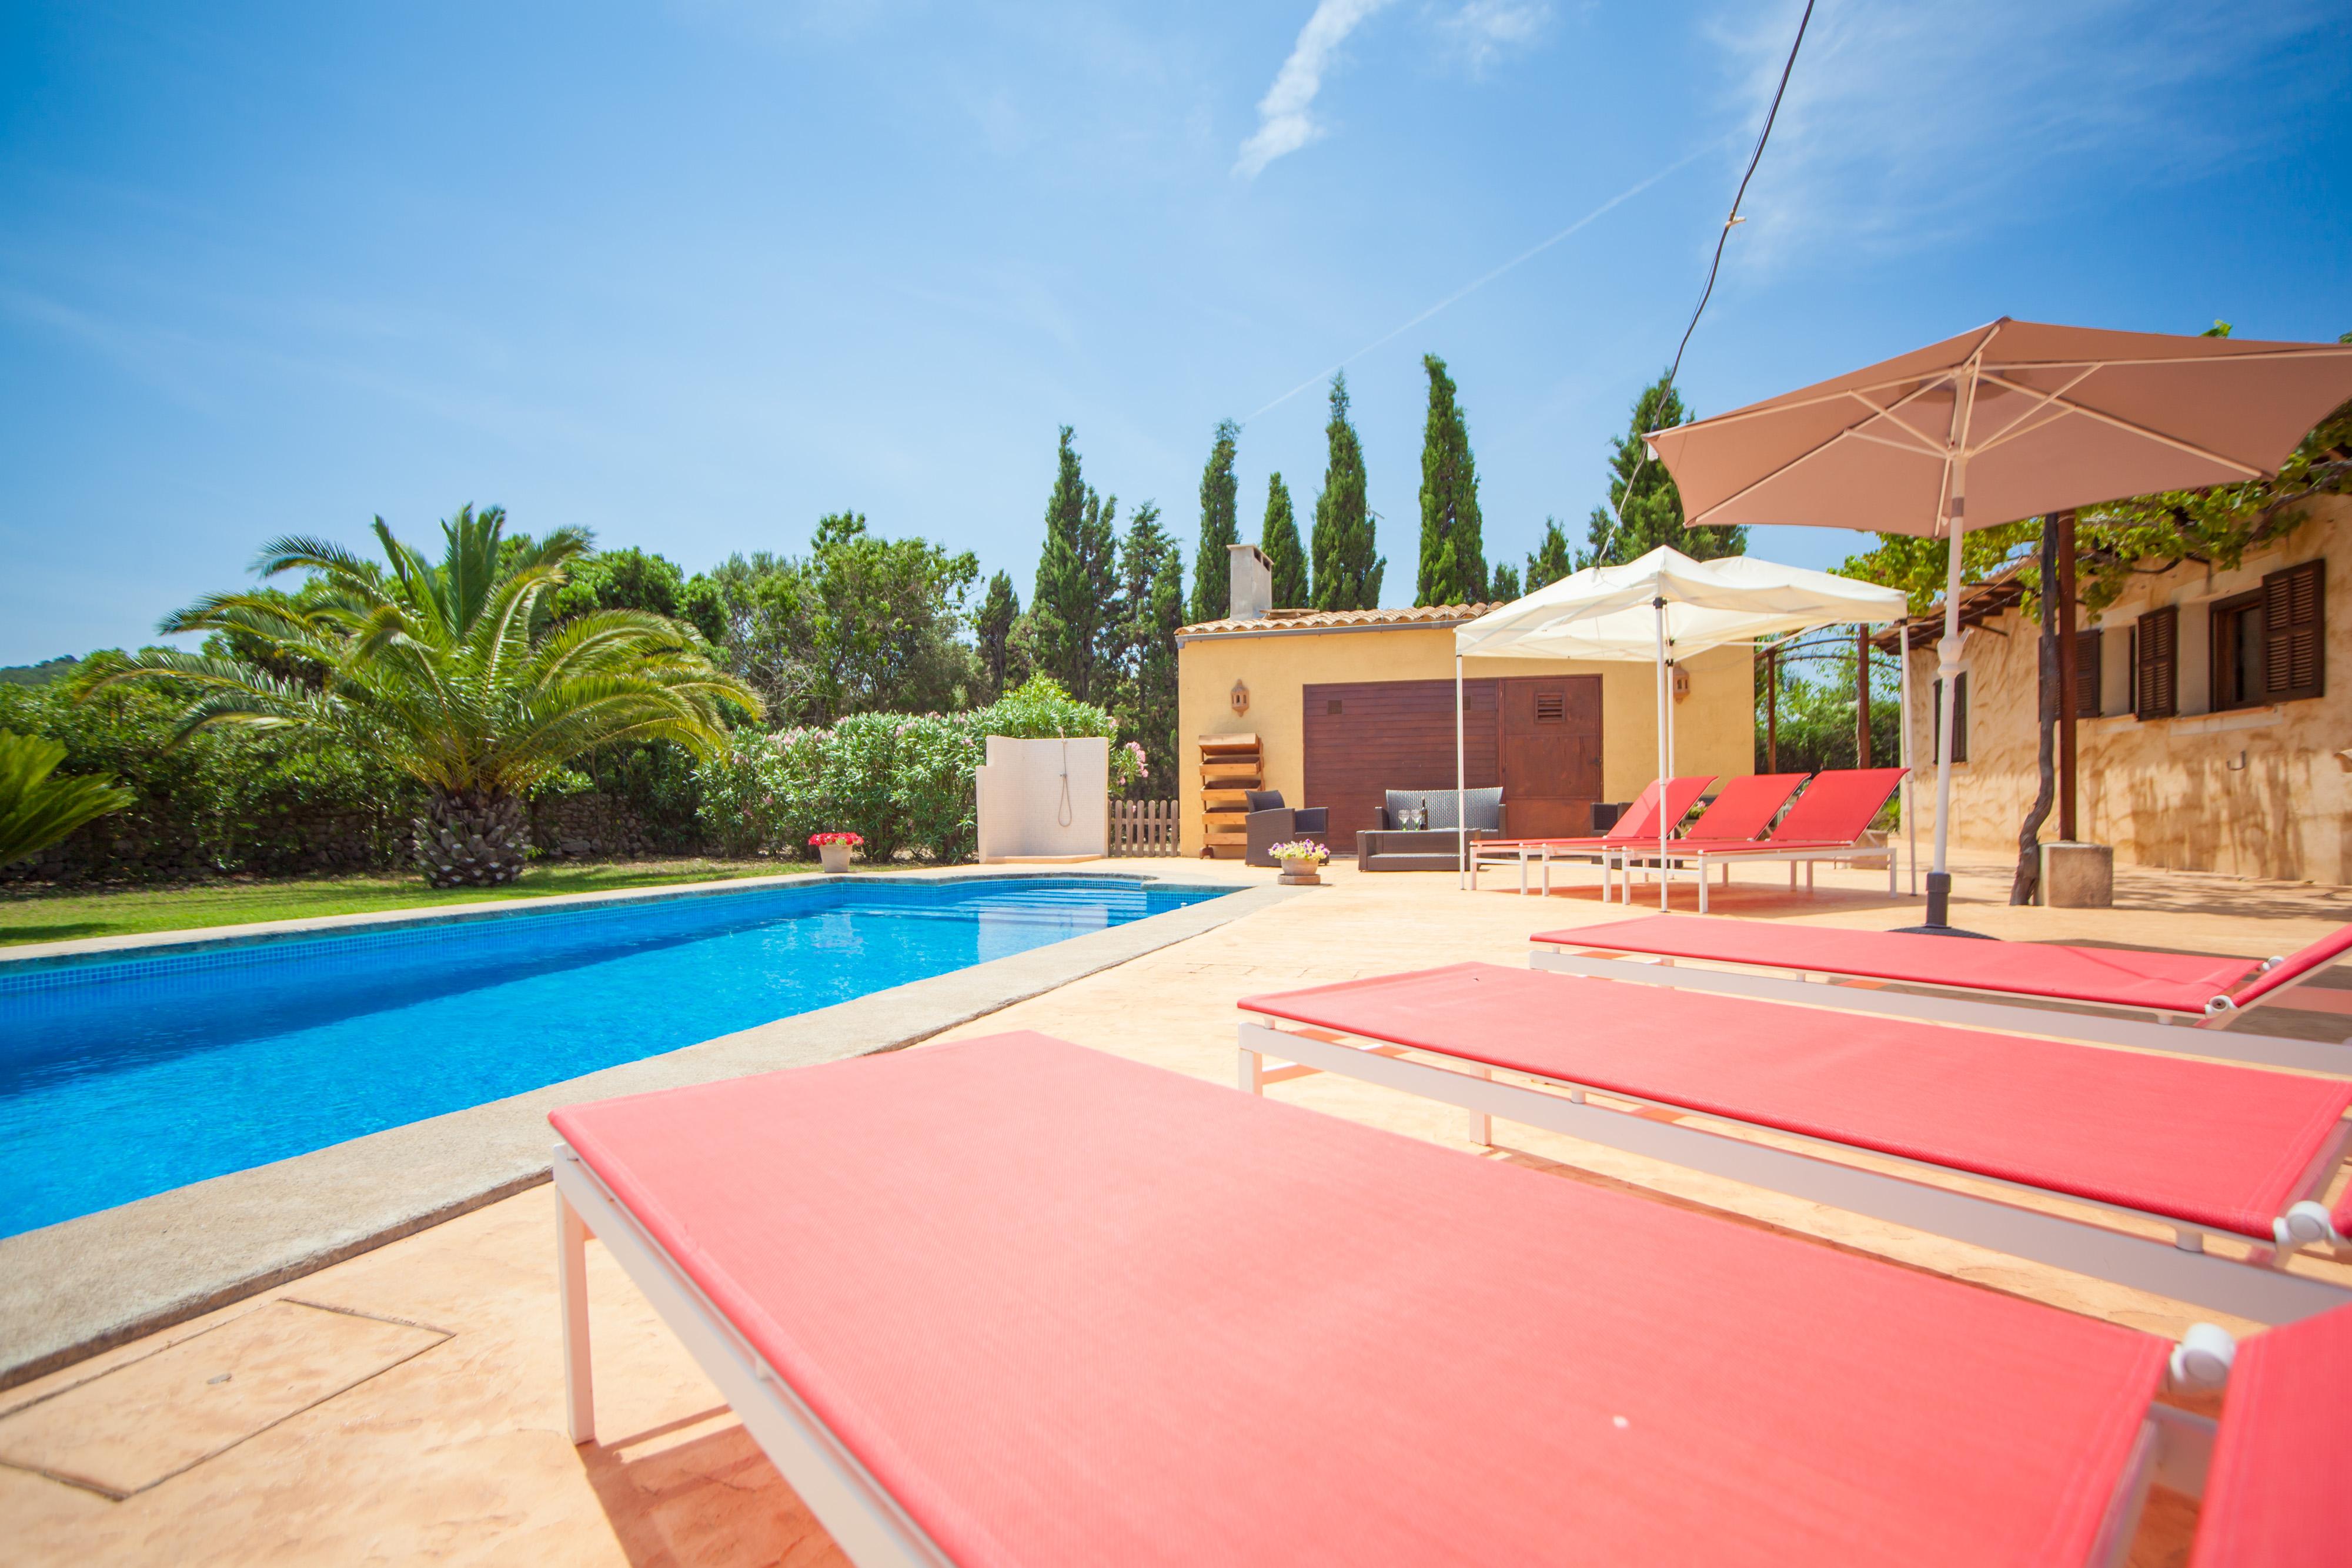 Ferienhaus SA CORBAIA (2020559), Arta, Mallorca, Balearische Inseln, Spanien, Bild 10